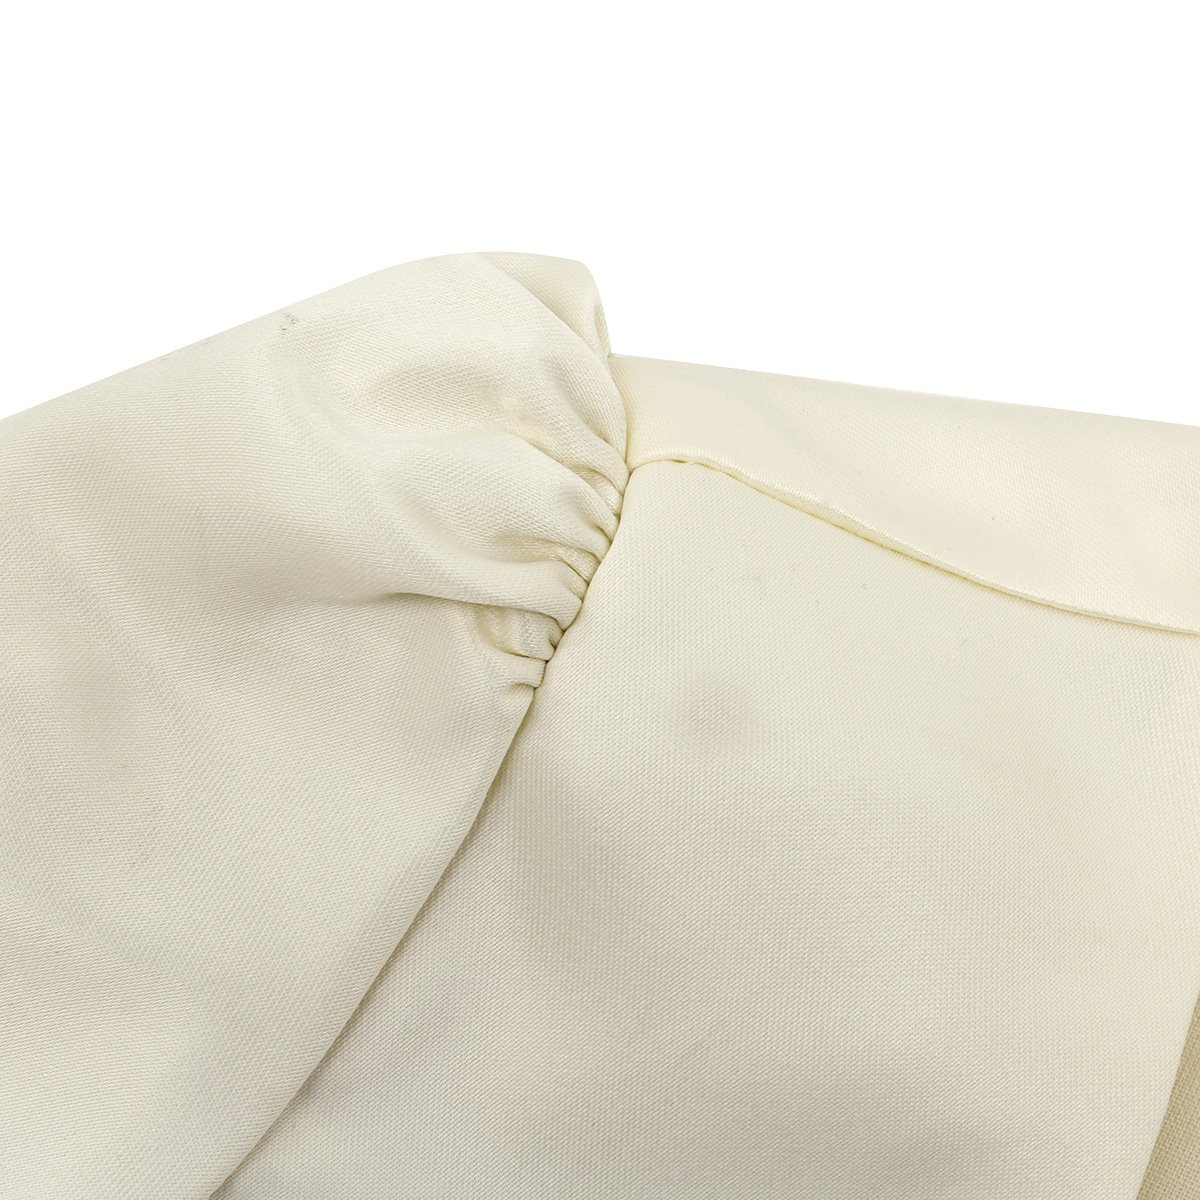 iixpin Kids Girls Bolero Shrug Cardigan Wedding Bridesmaid Formal Party Dress Cover Up Long Sleeves Jacket